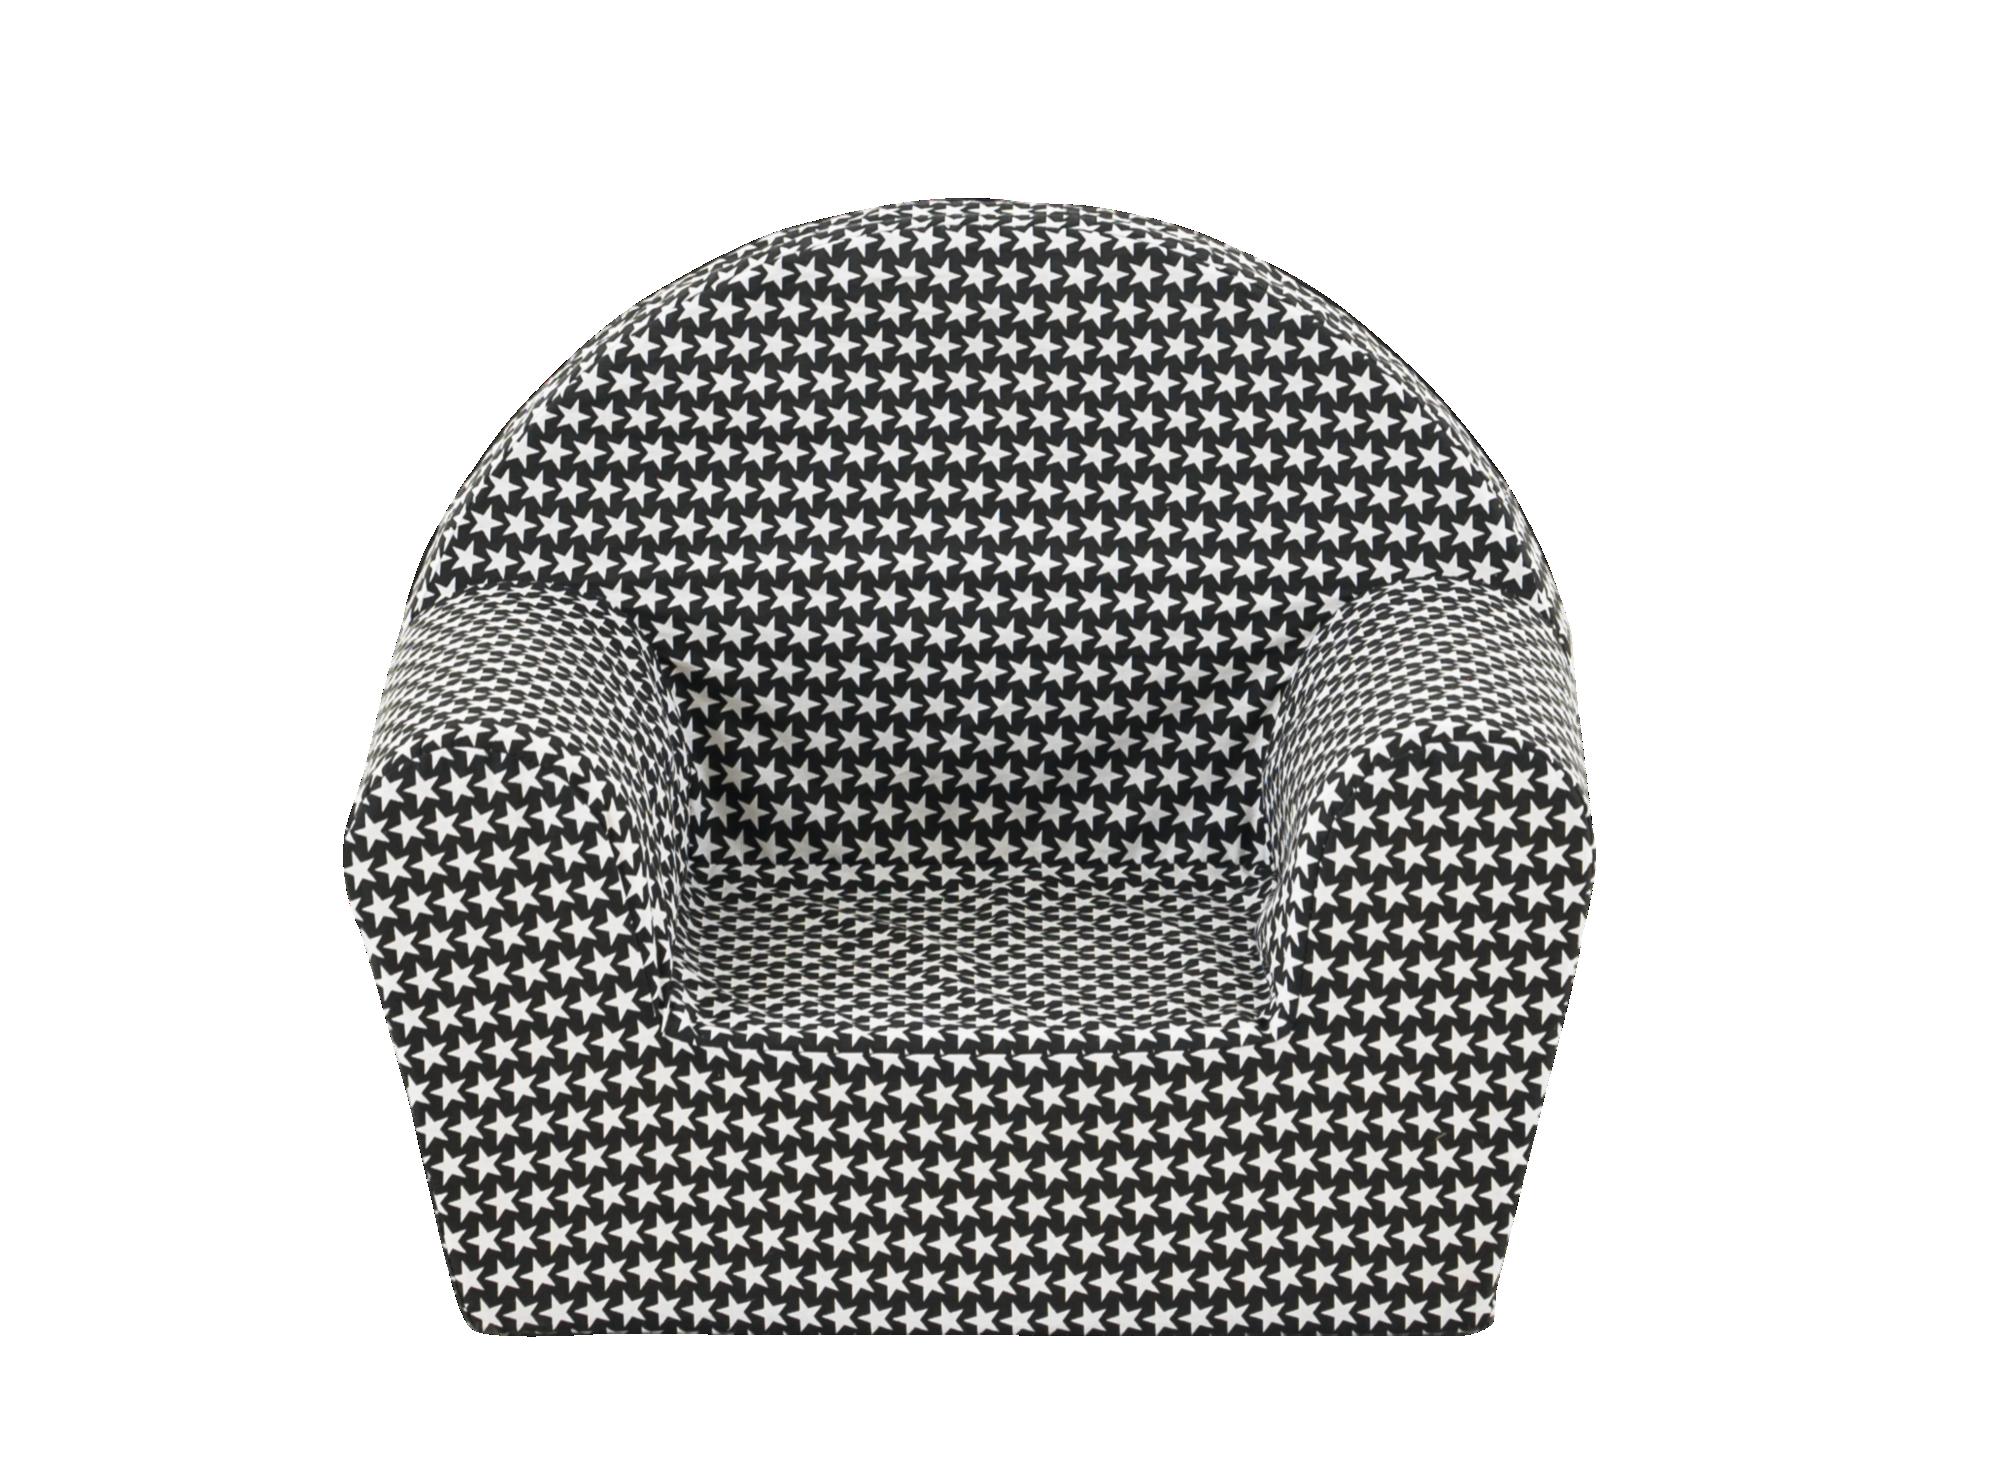 Garnissage mousse polyurethane d.16kg/m3. revetement housse tissu 40% ...